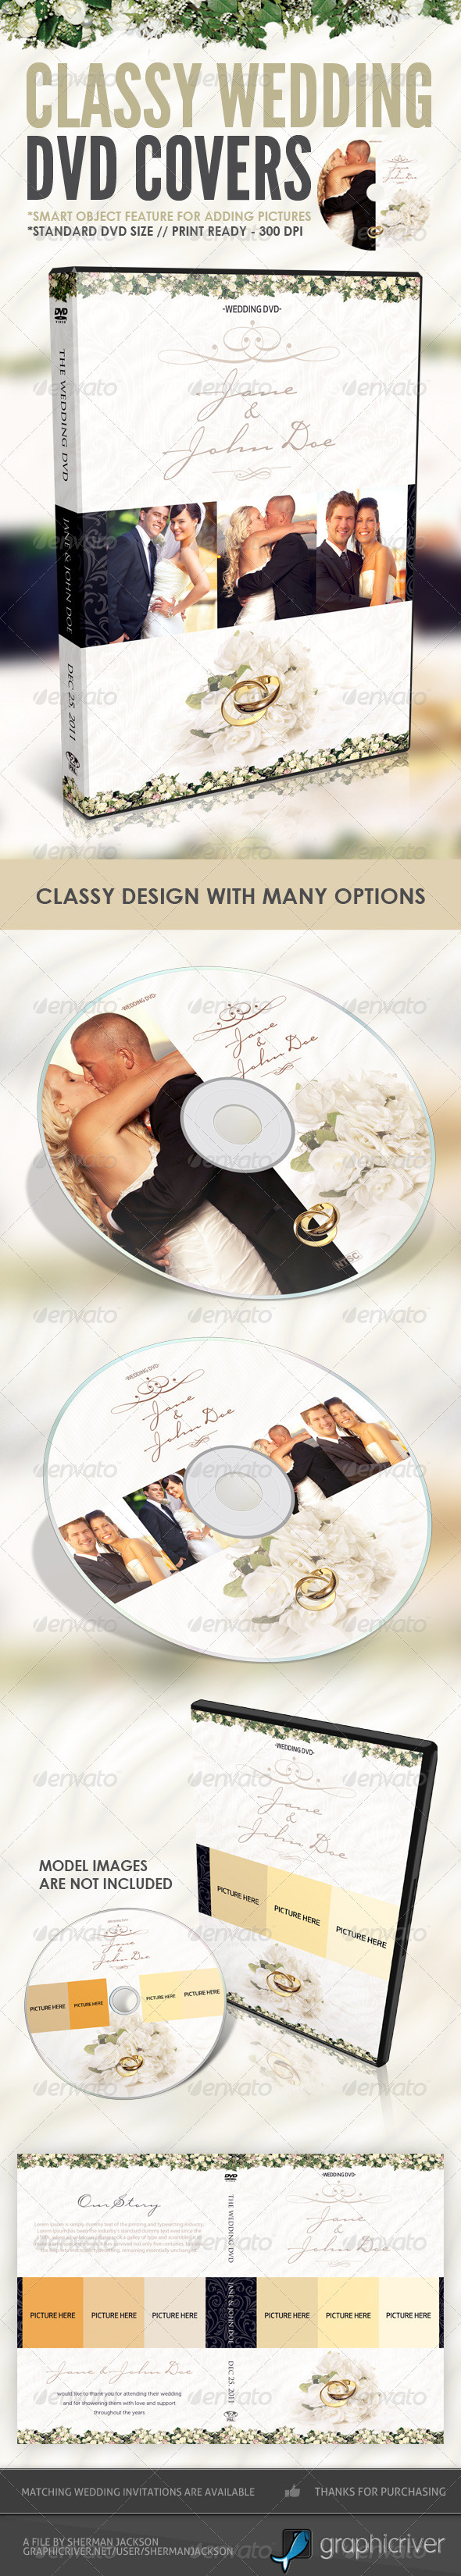 Classy Wedding DVD Covers - CD & DVD Artwork Print Templates